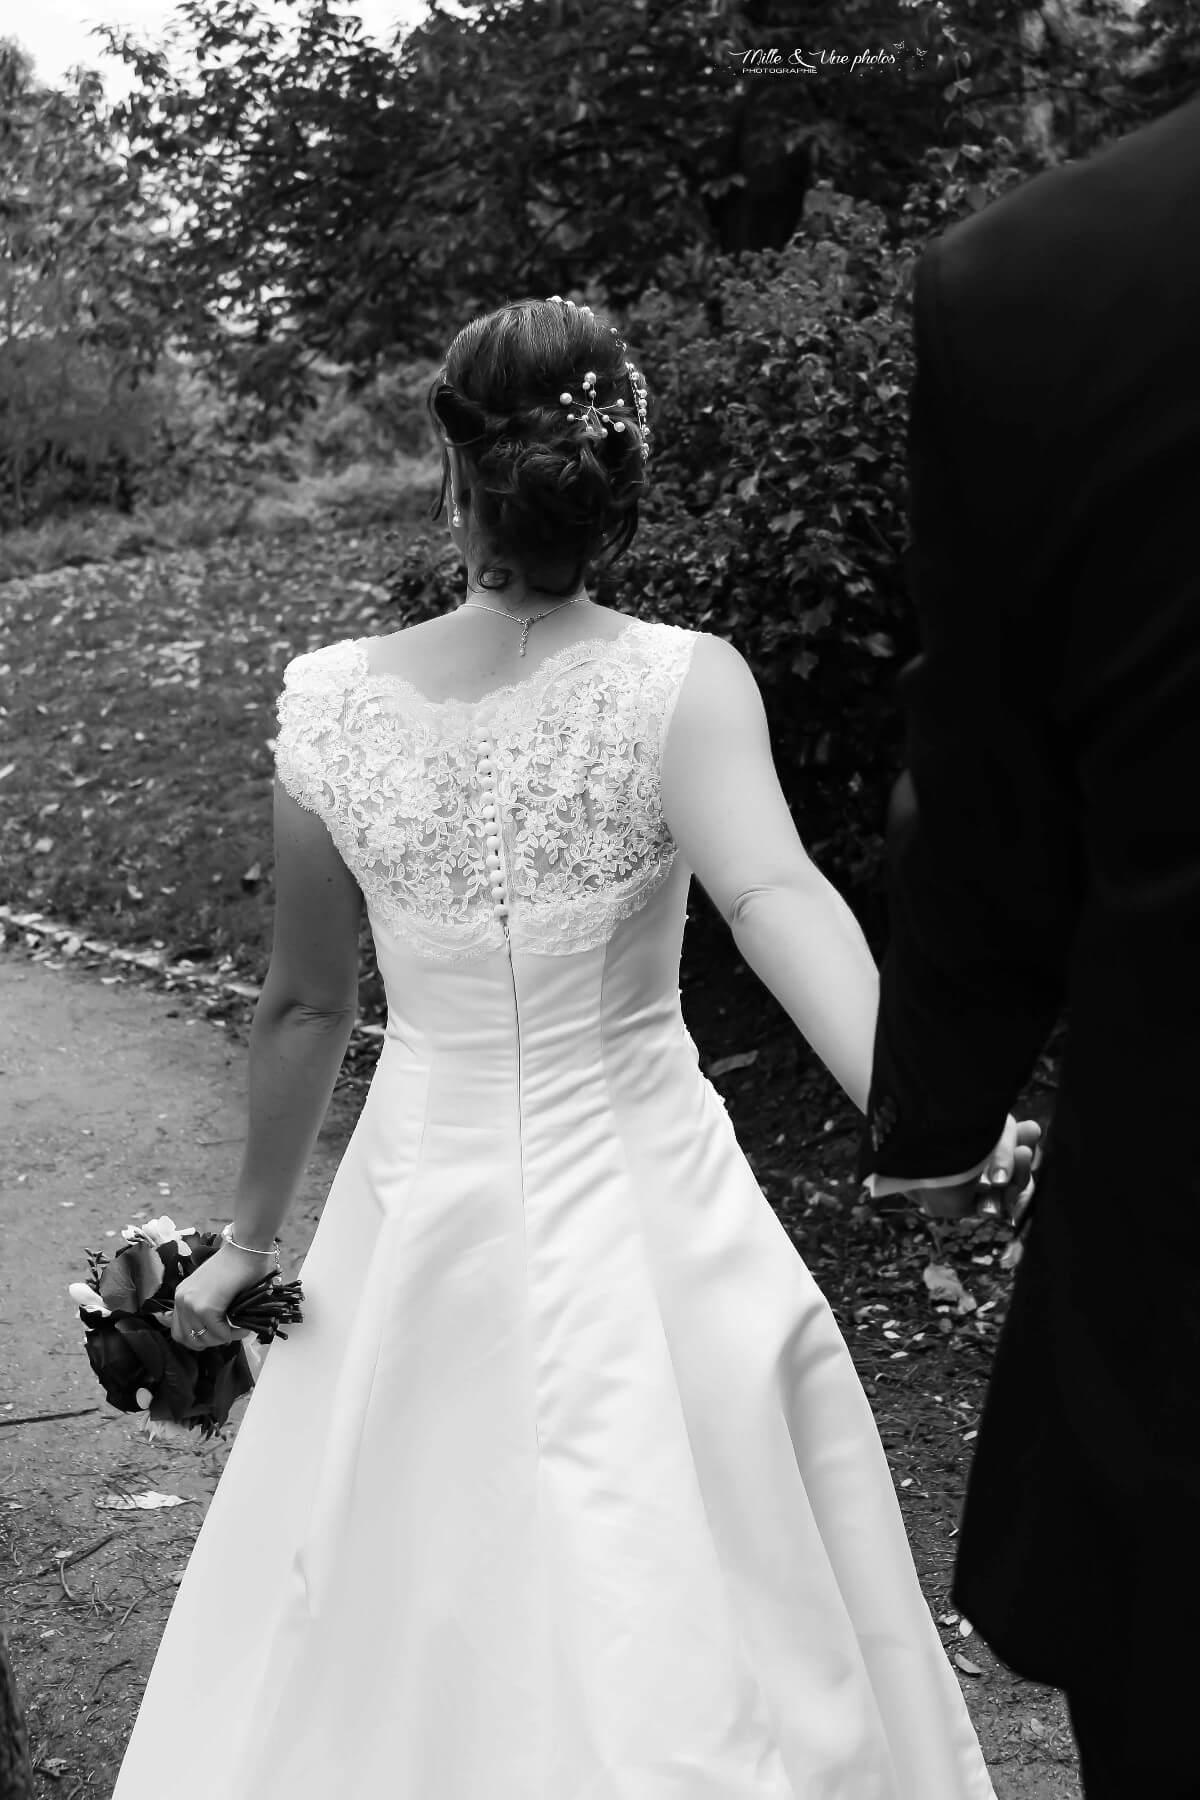 Mariage couple 1001photos moselle 1